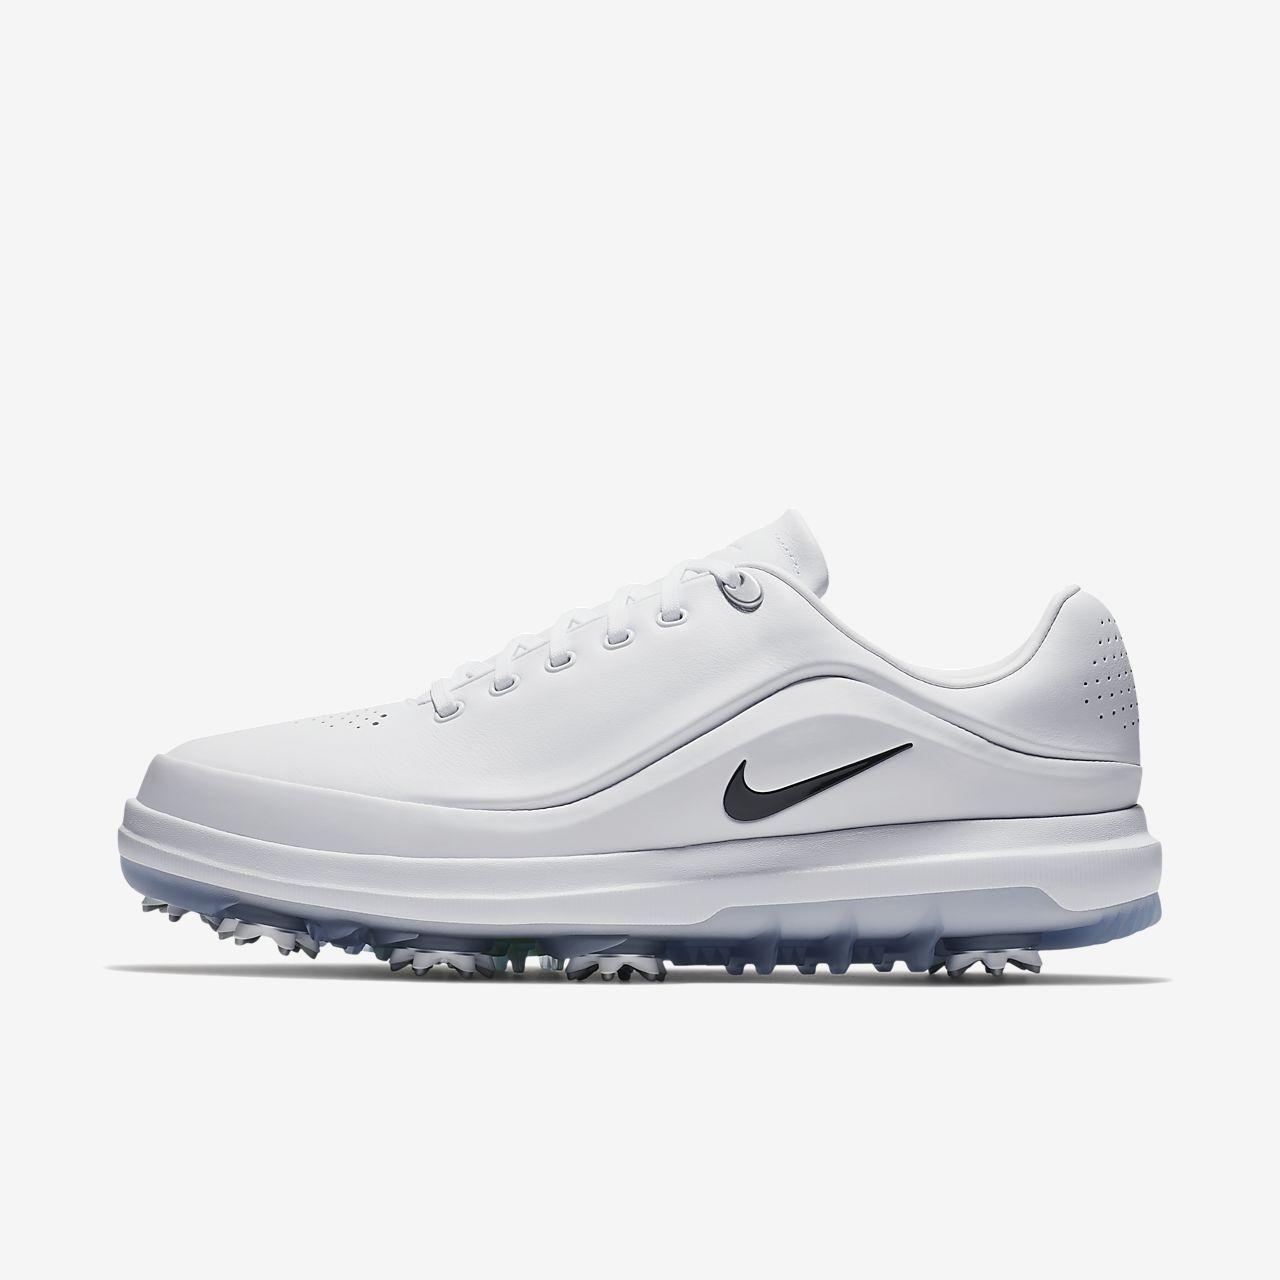 new product d61de f17fe Scarpa da golf Nike Air Zoom Precision - Uomo